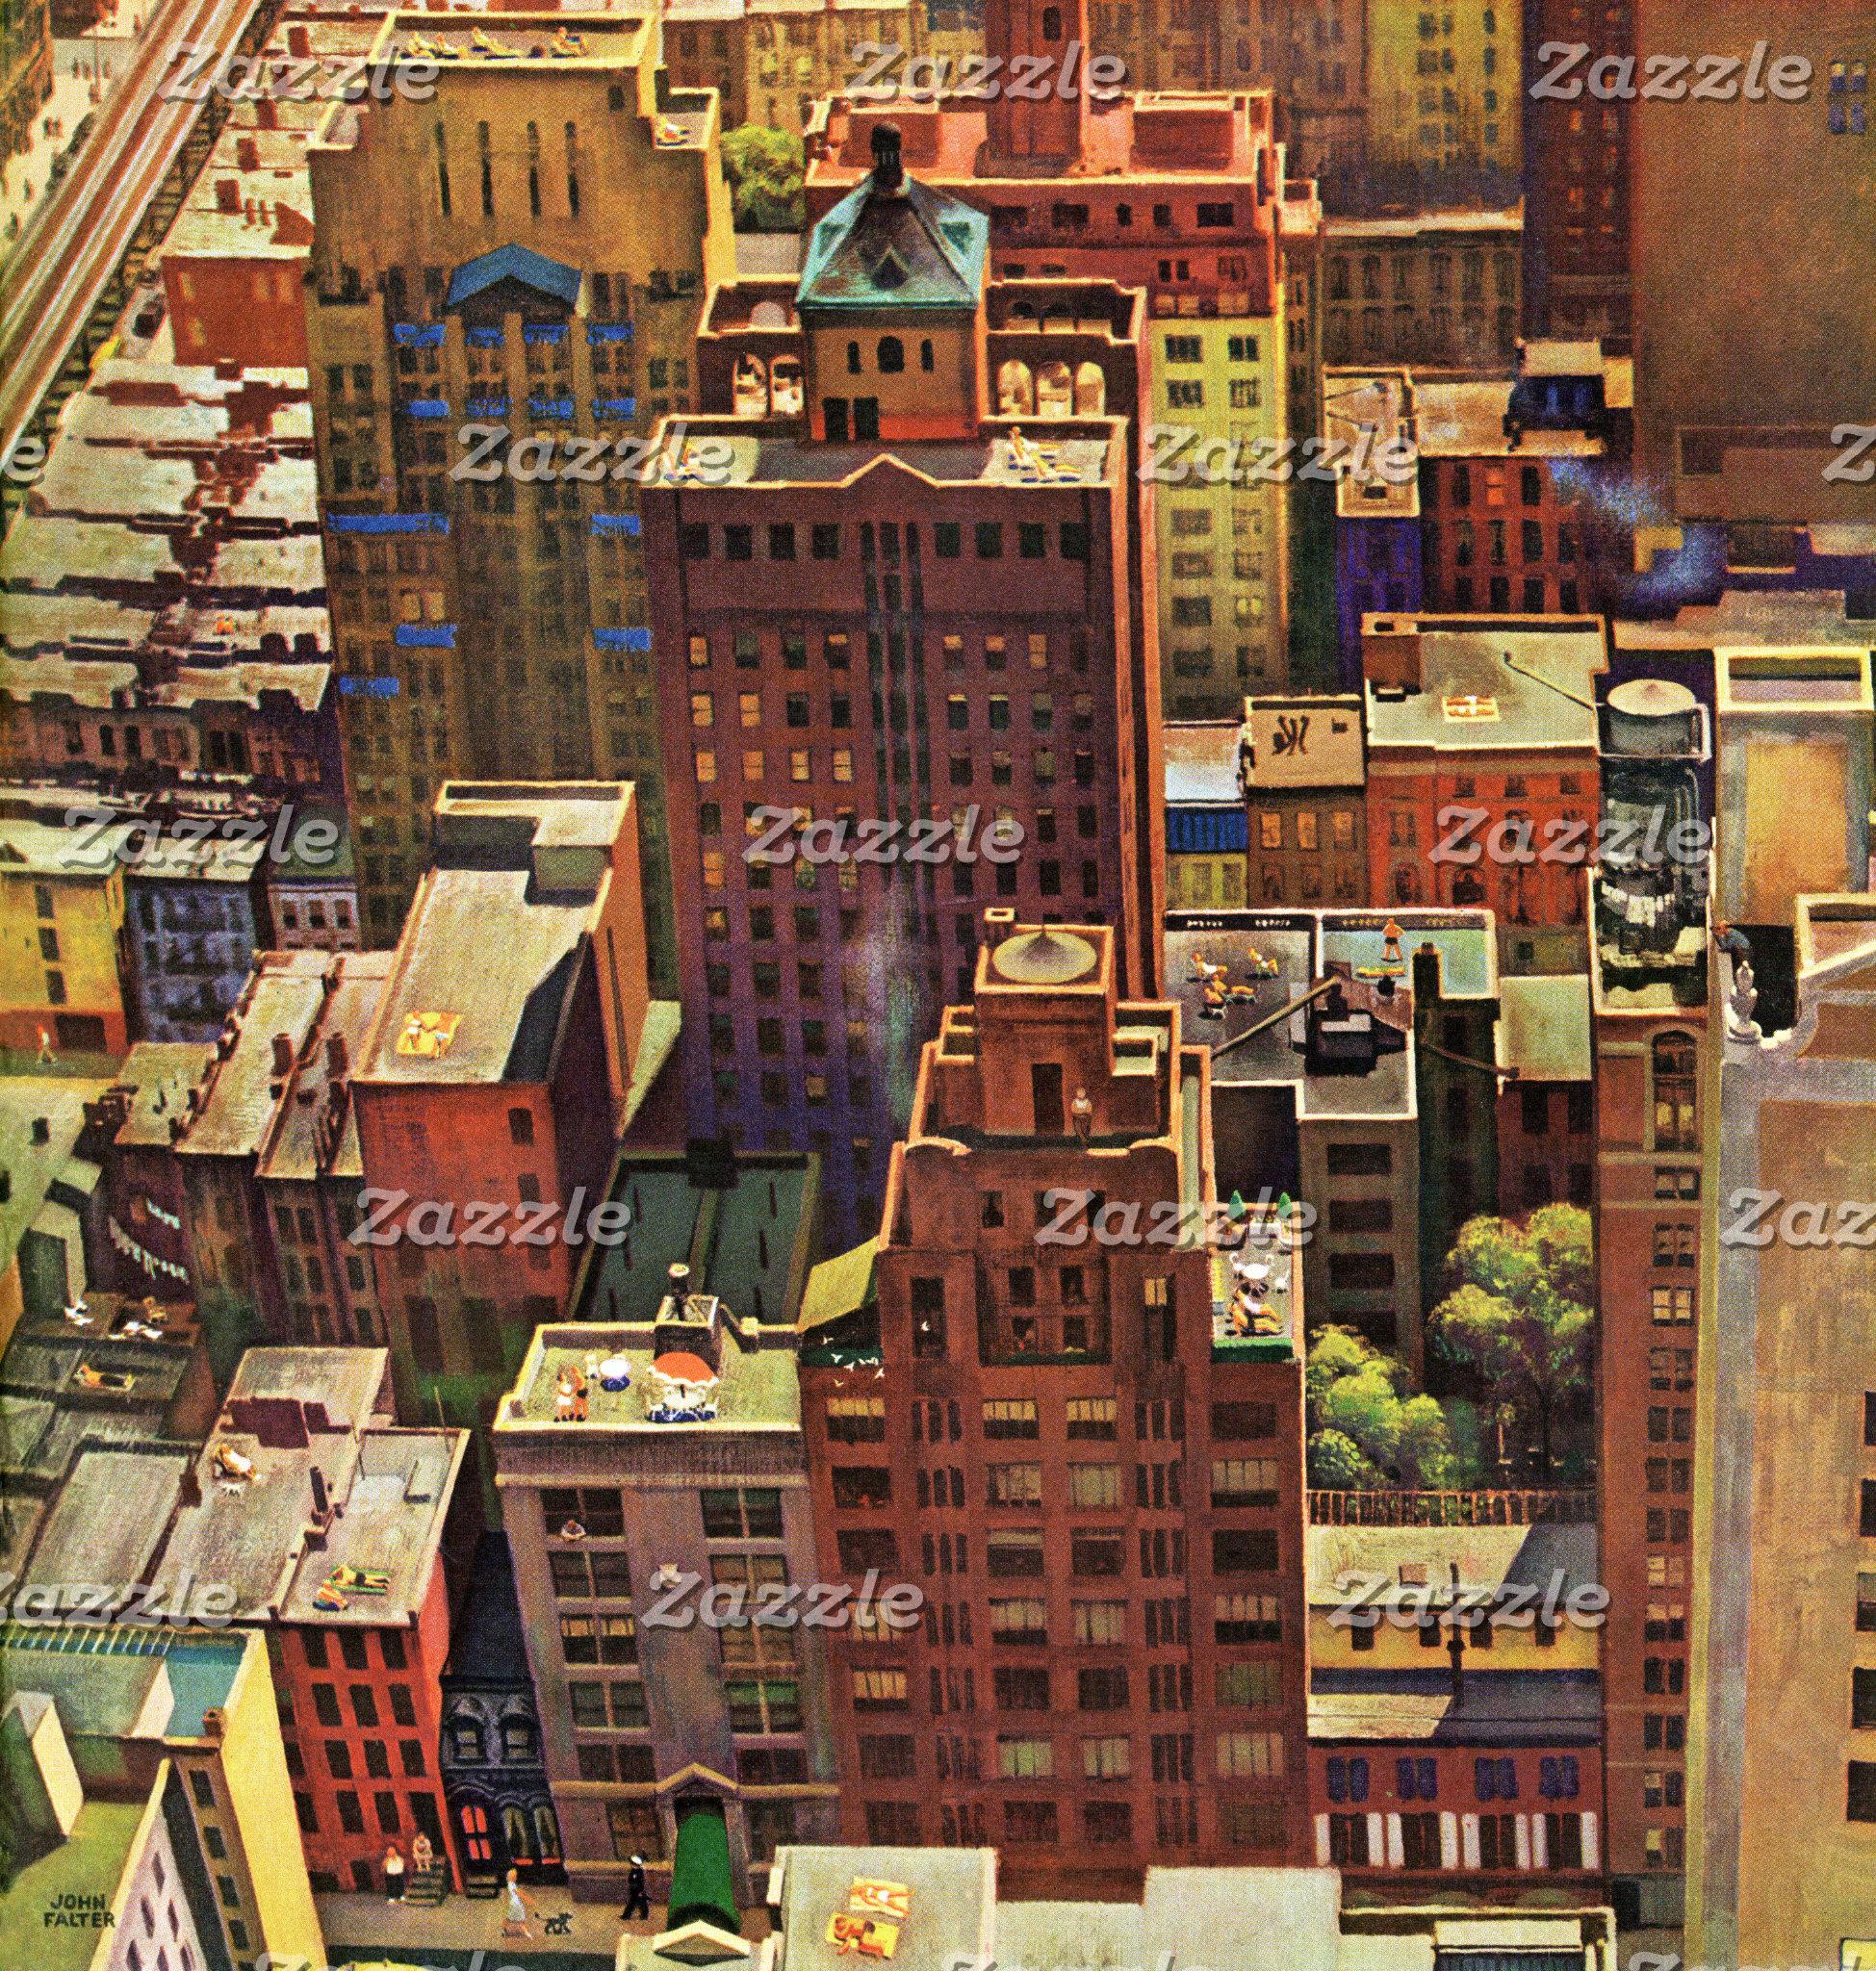 Bird's-Eye View of New York City by John Falter